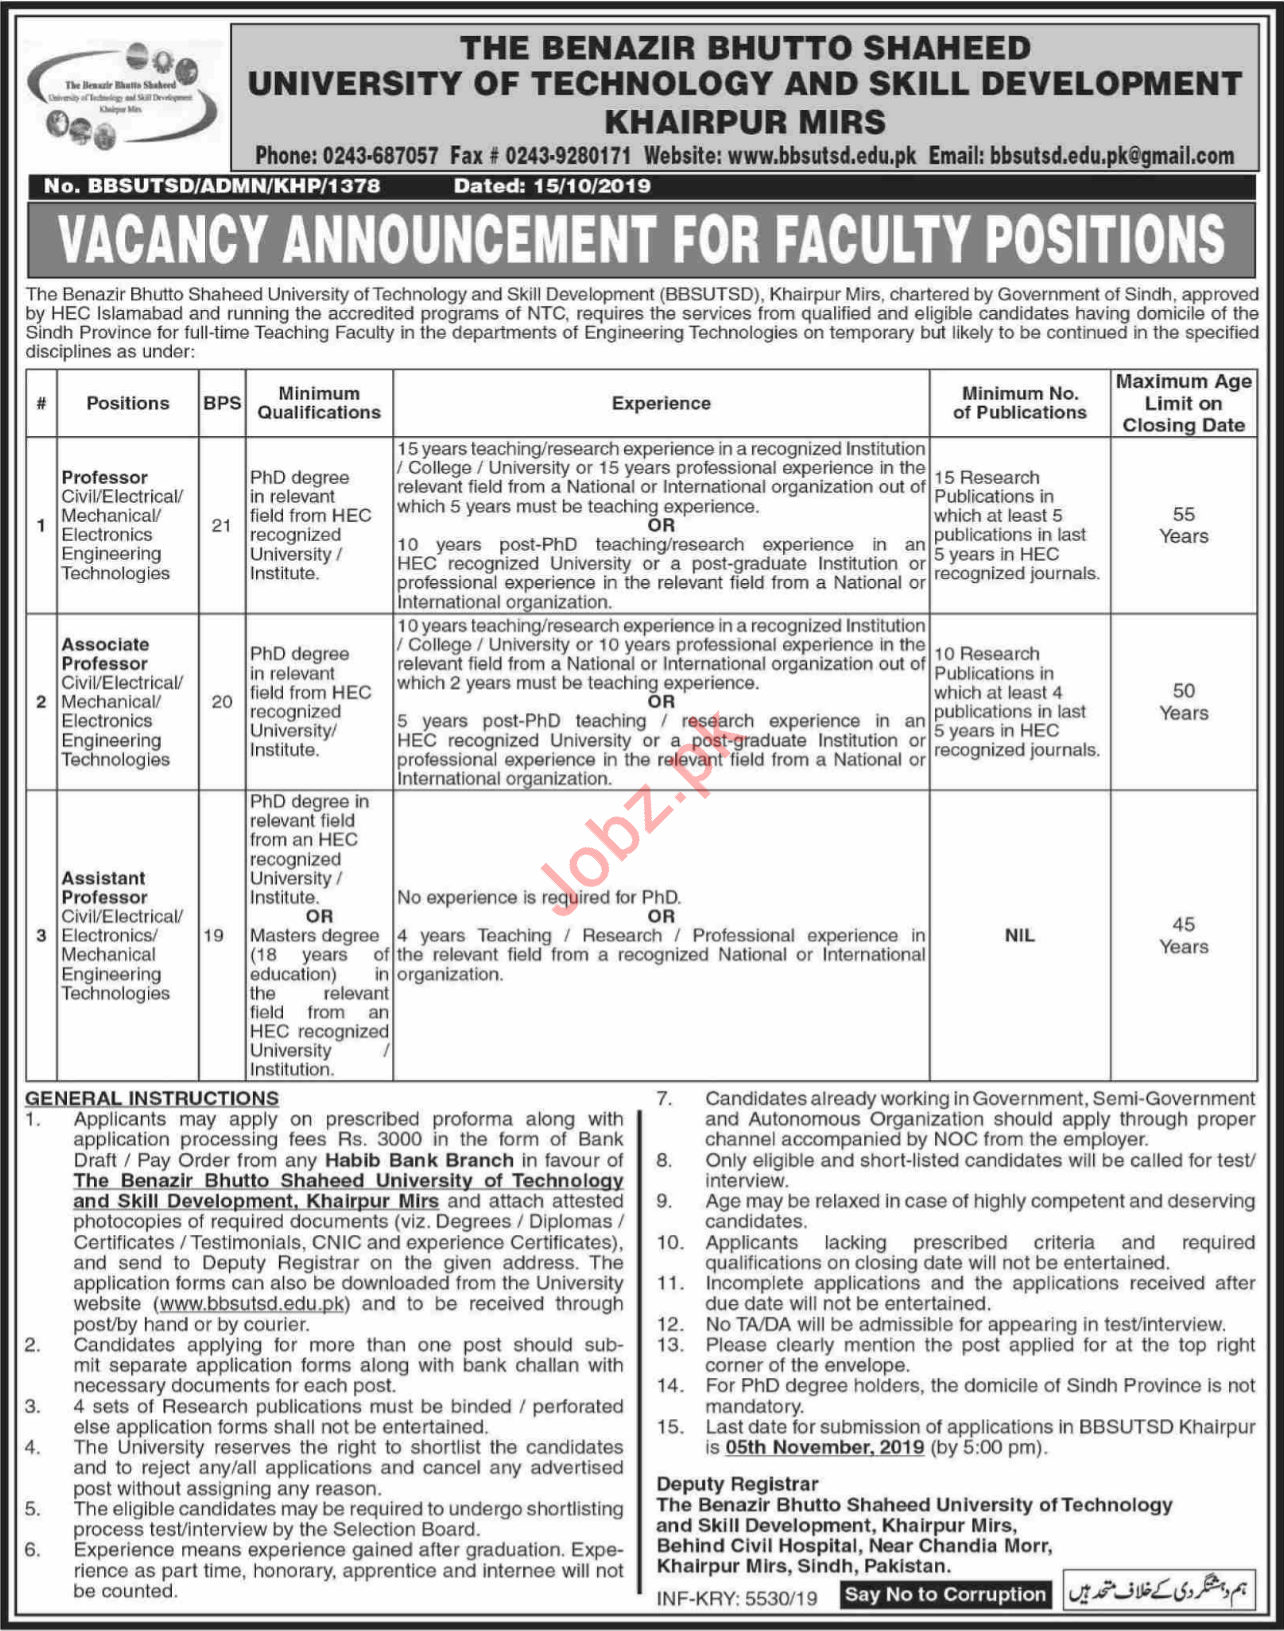 University of Technology & Skill Development Faculty Jobs